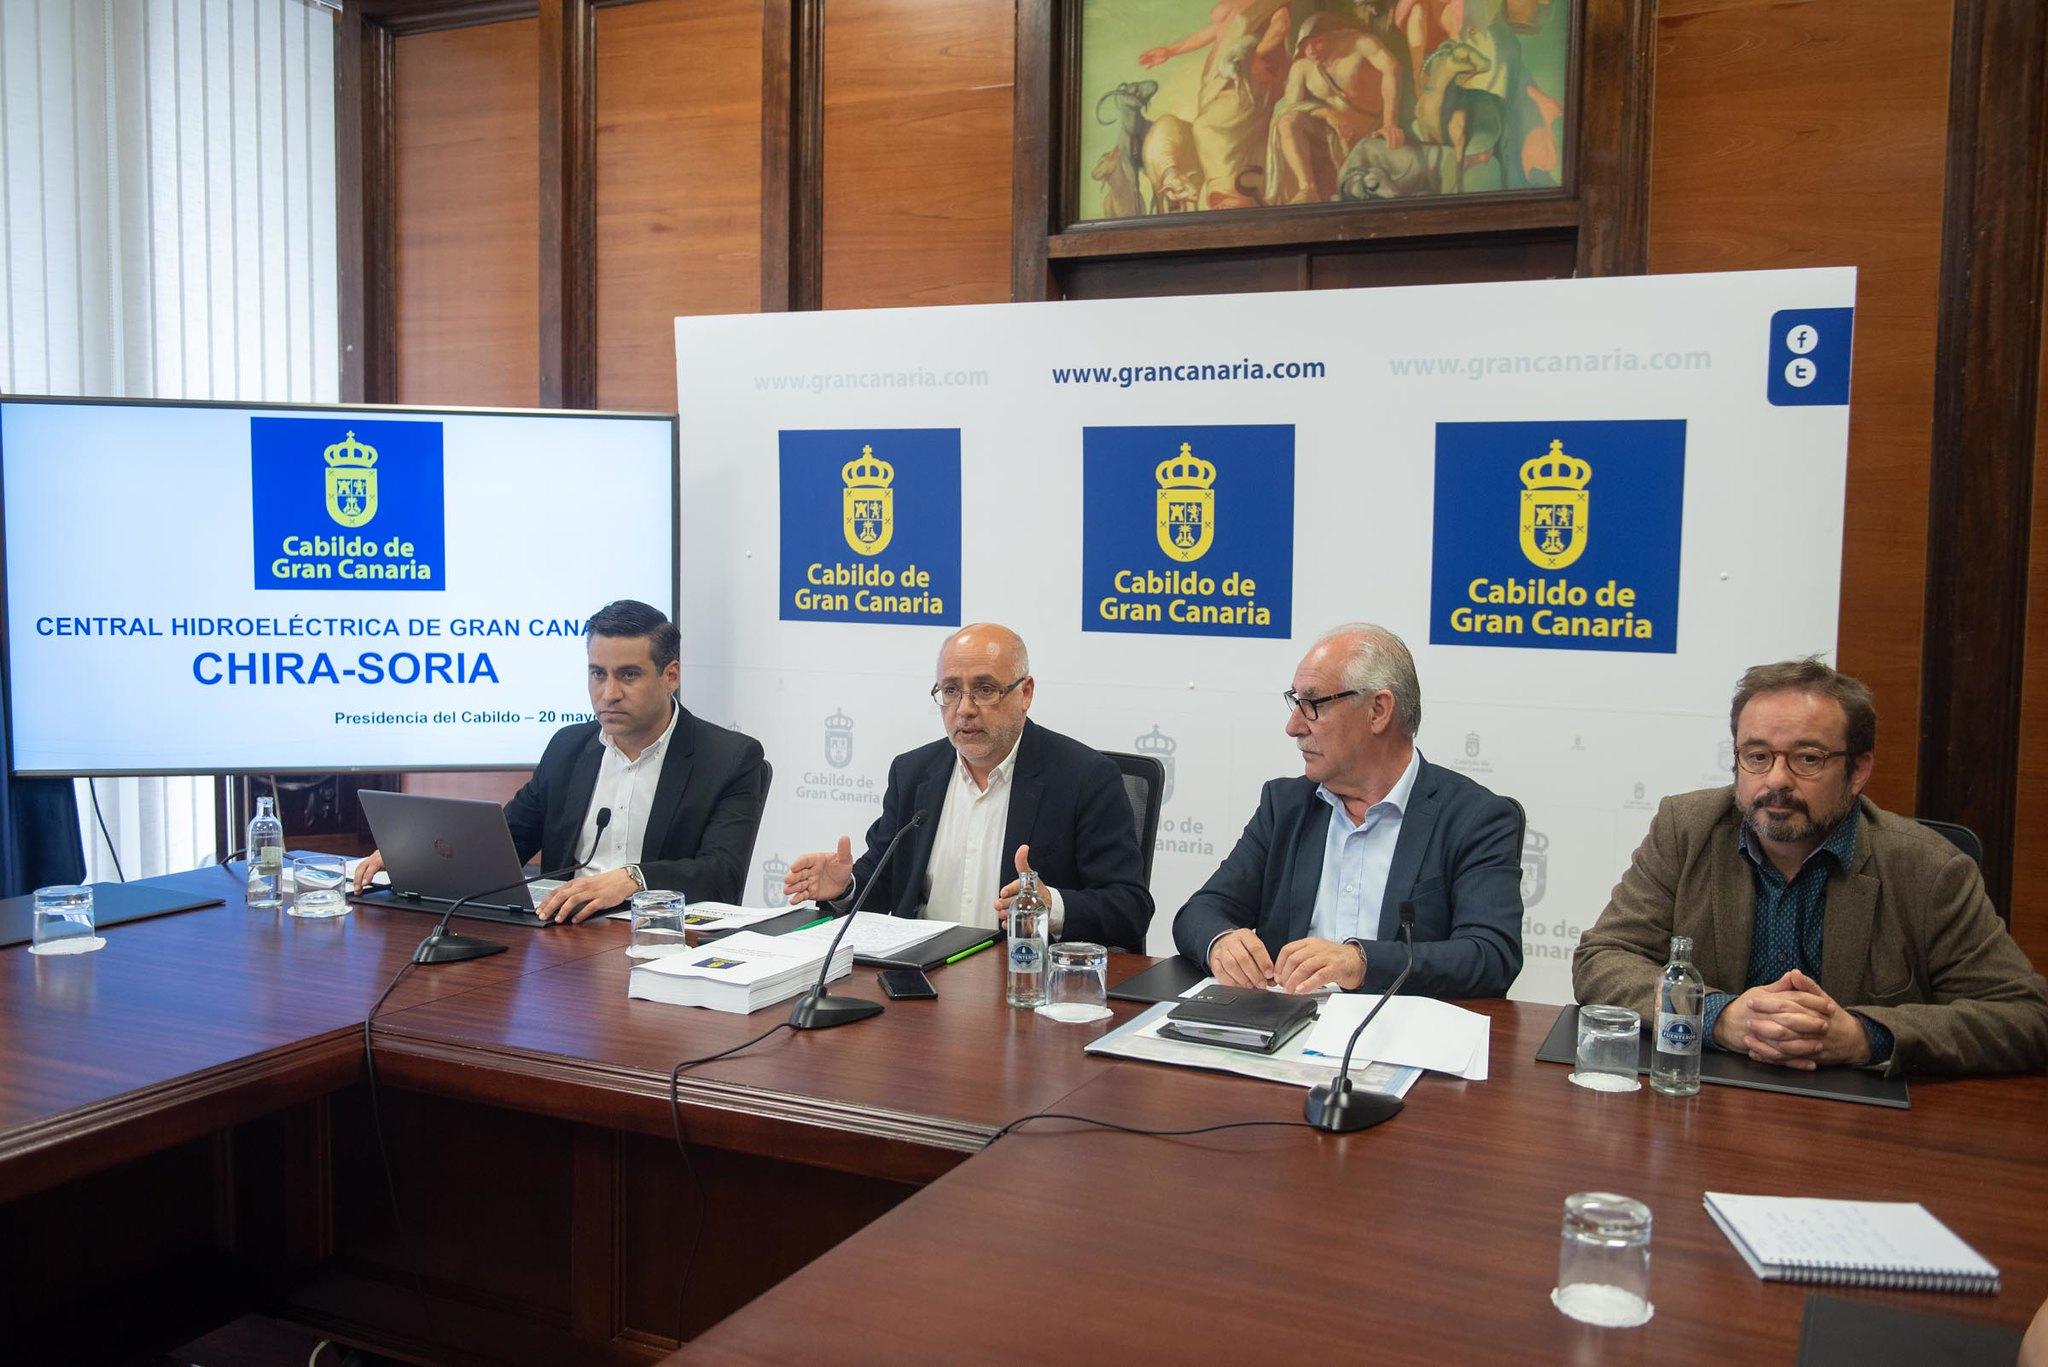 alegaciones del Cabildo al proyecto Chira- Soria